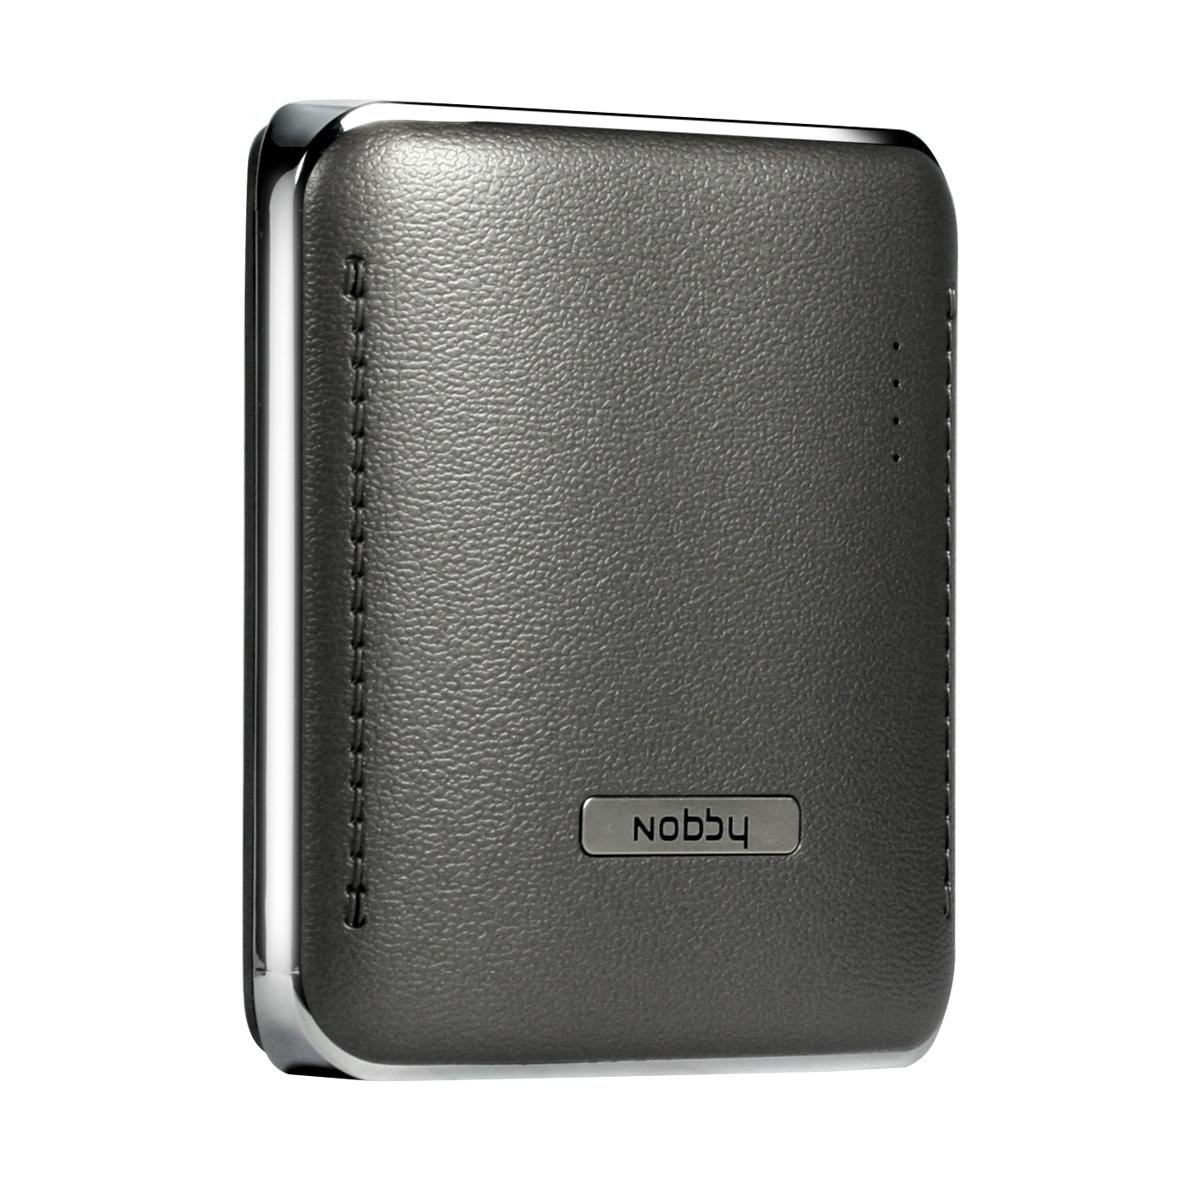 все цены на Nobby Comfort 015-001, Grey внешний аккумулятор (4000 mAh) онлайн